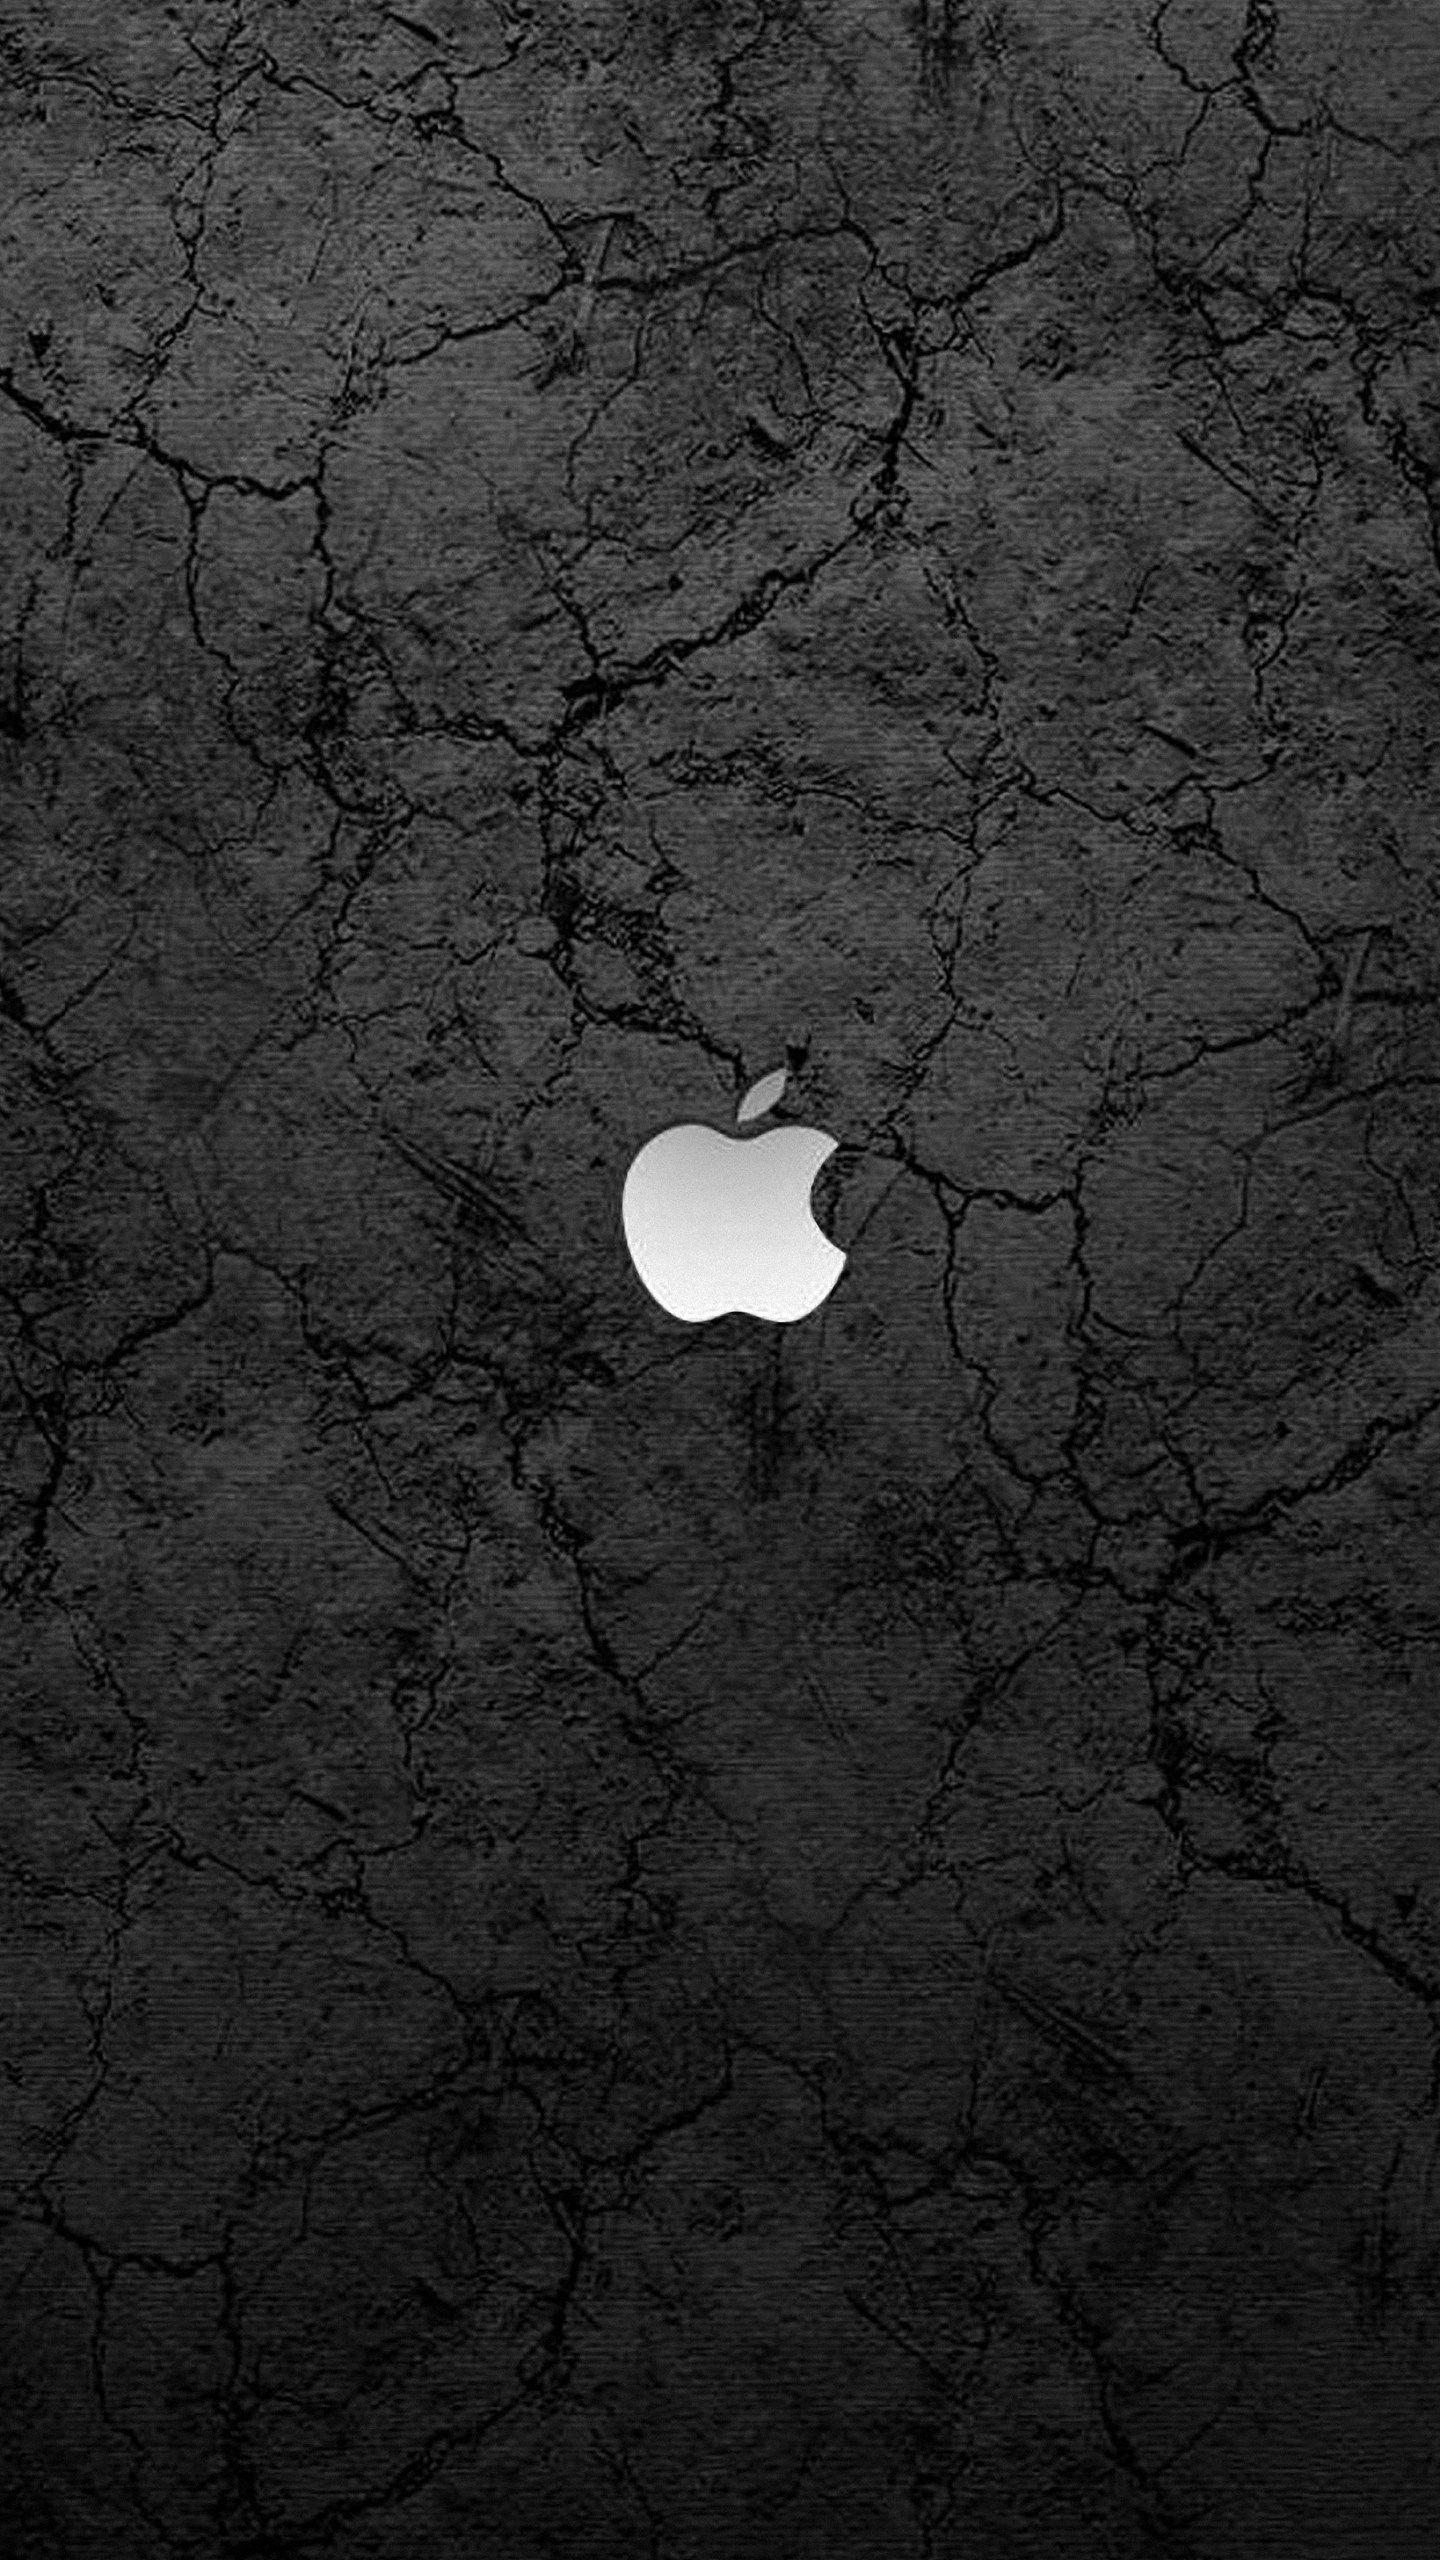 Iphone 6s Wallpaper Hd 1440x2560